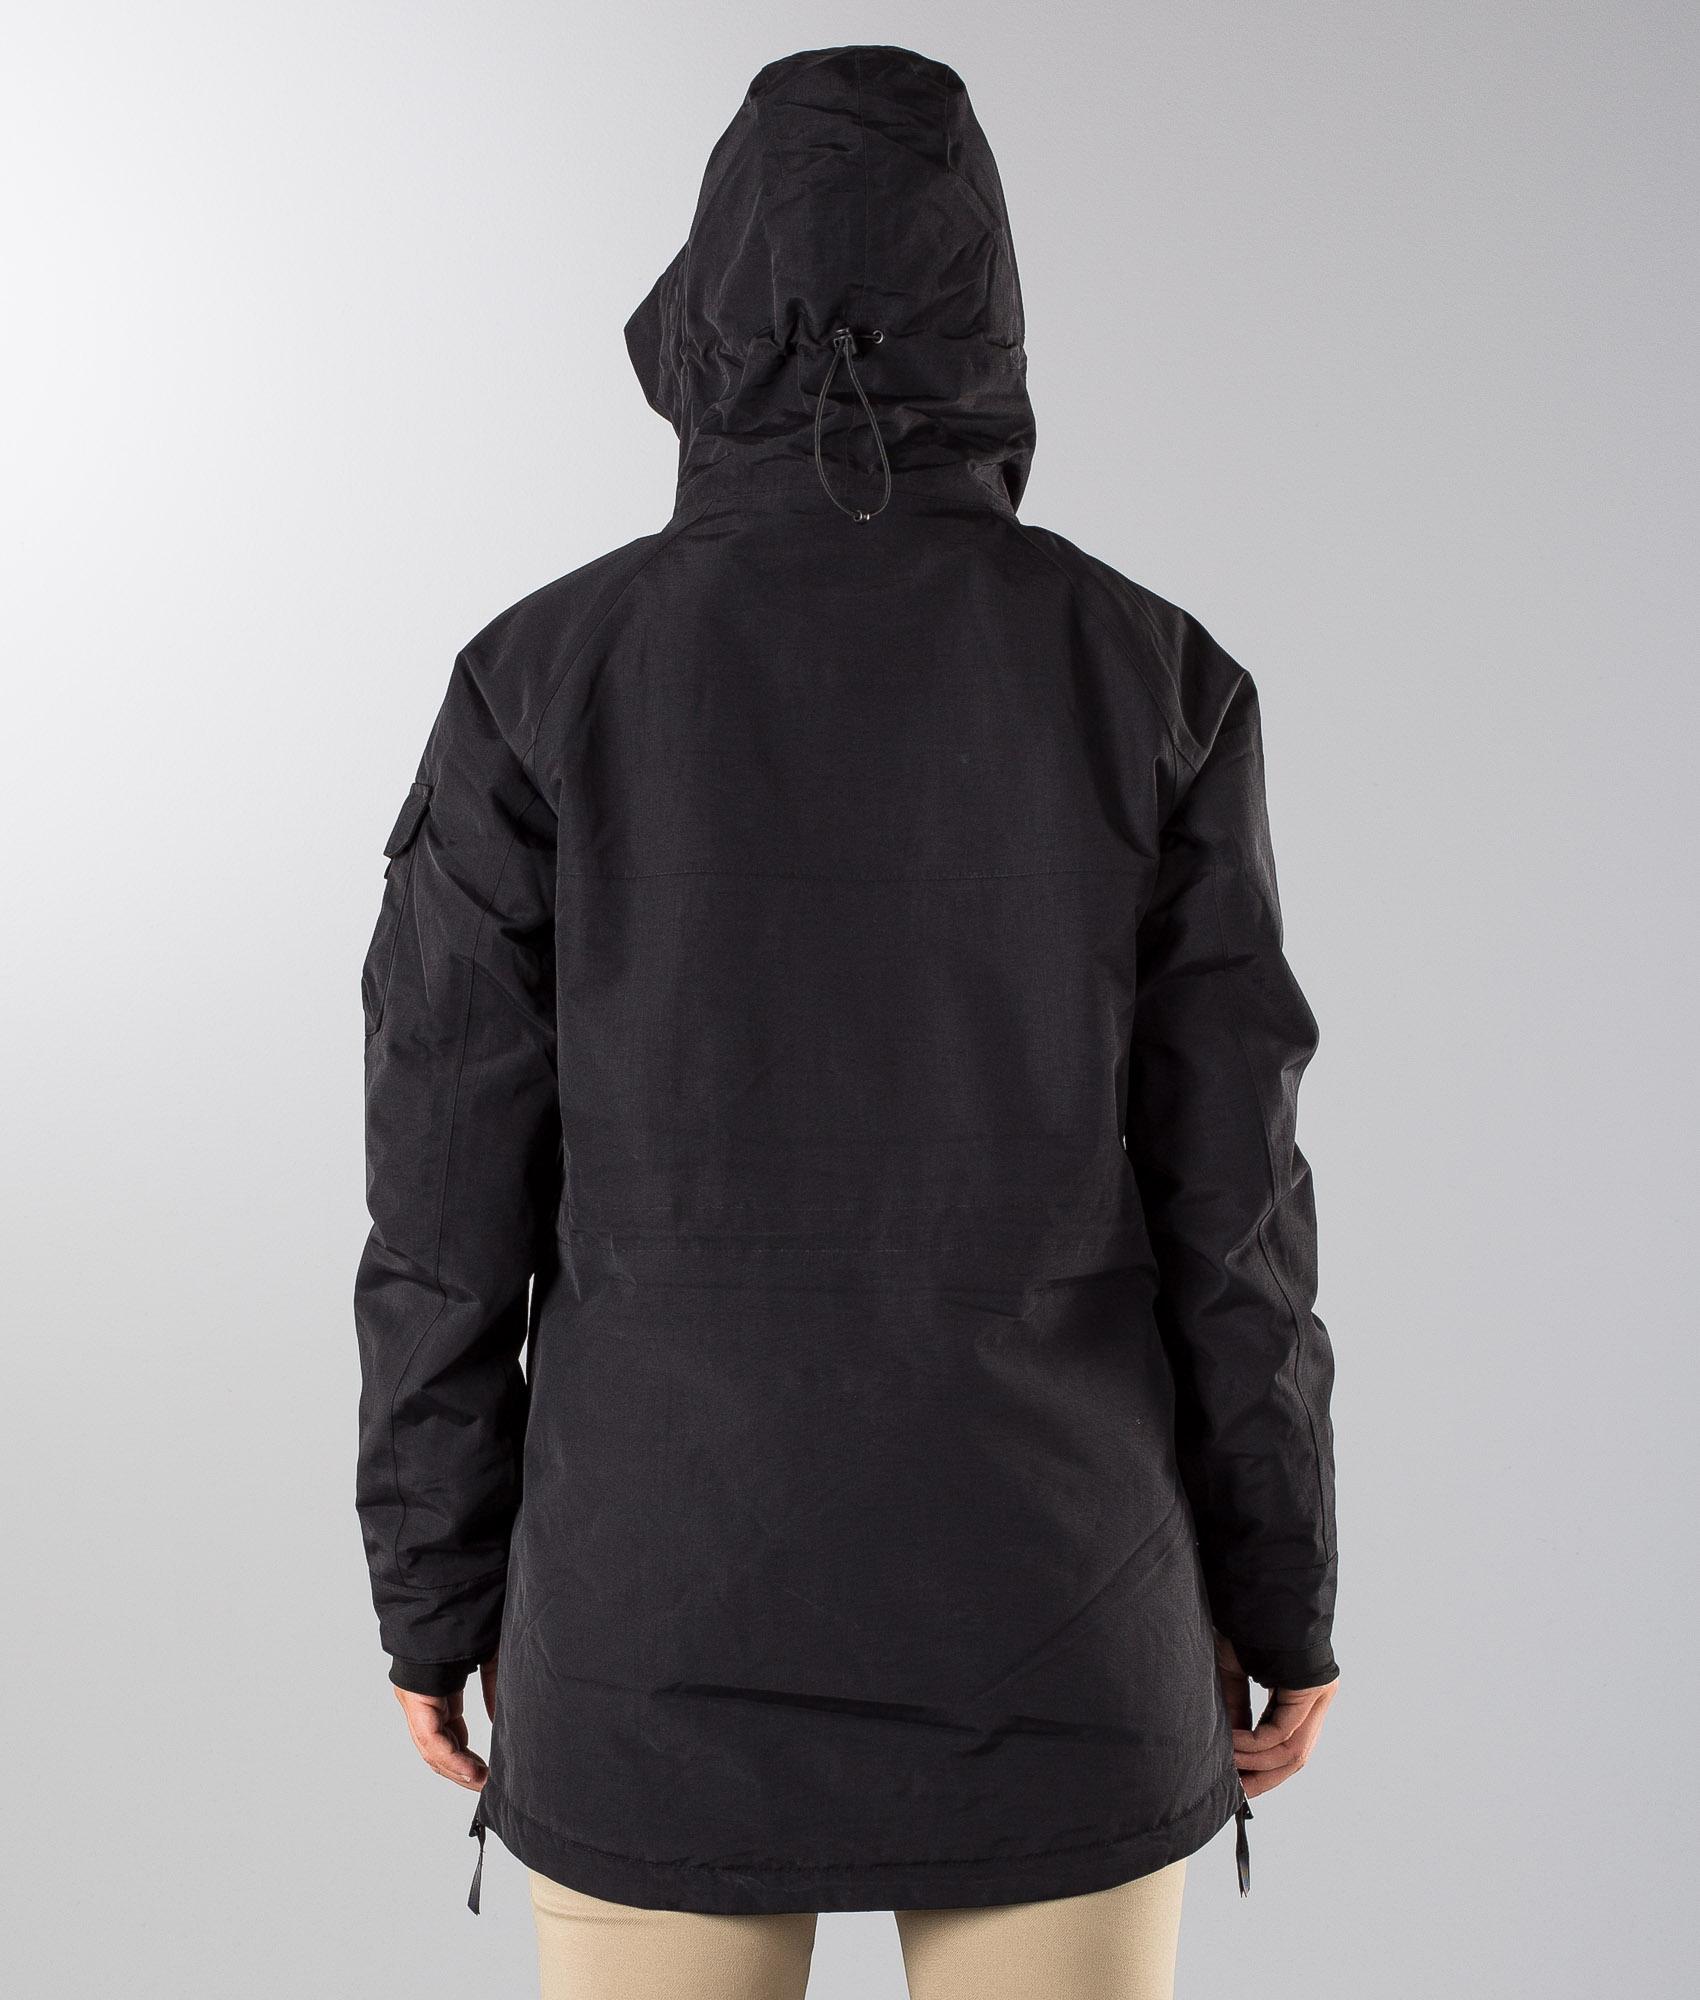 Dope Akin 18 Snowboard Jacket Black